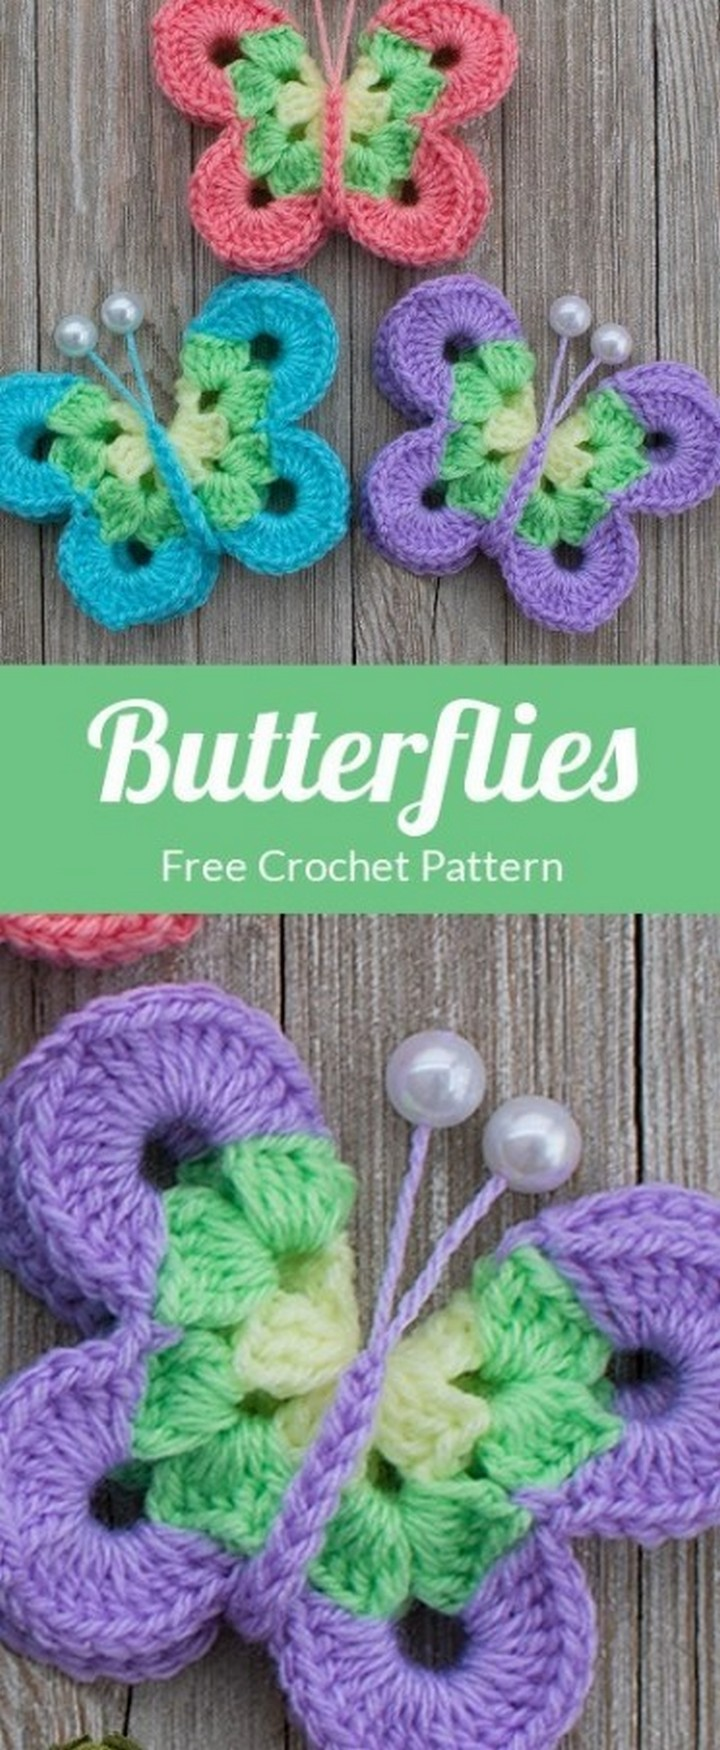 Beautiful Butterflies Free Crochet Patterns